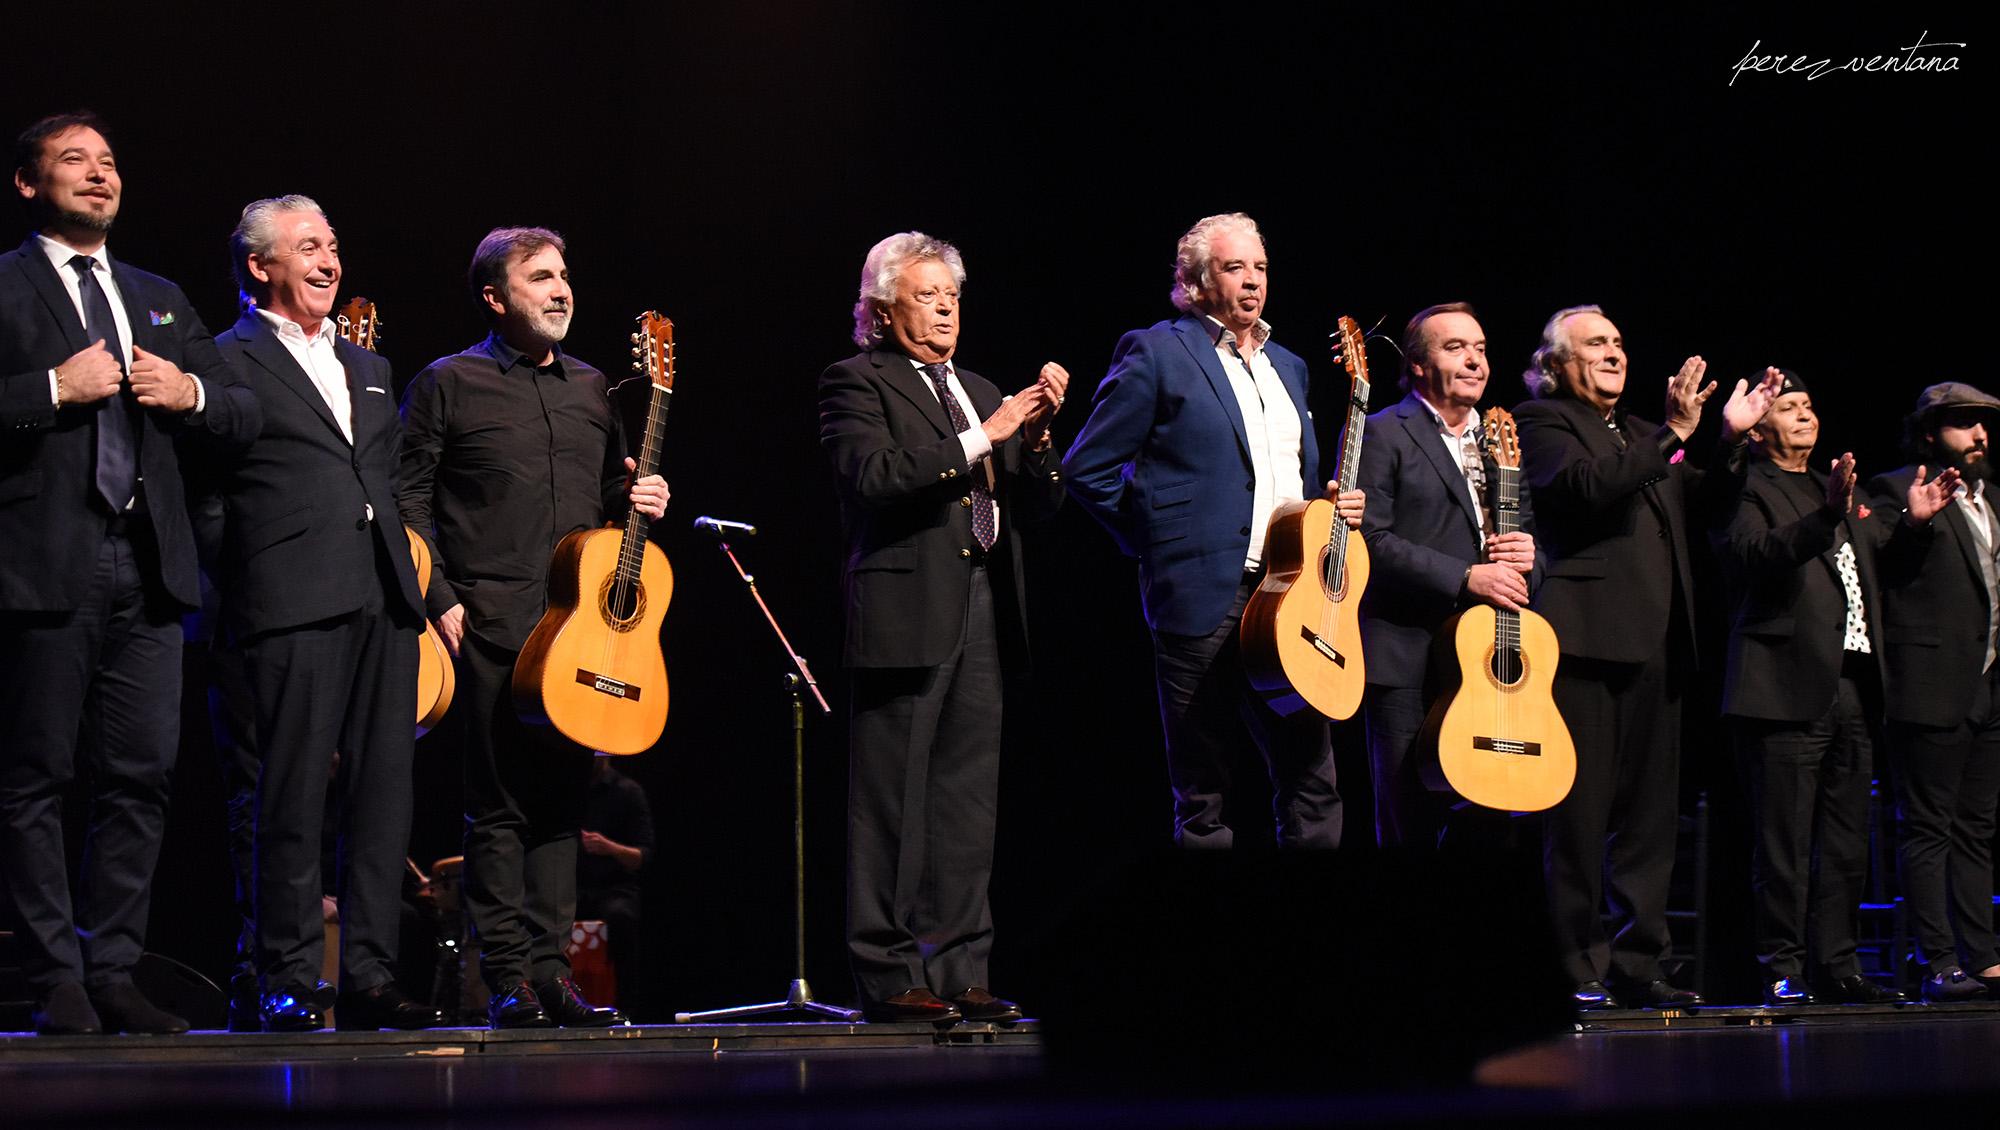 Los cantaores. Homenaje a Carmelilla Montoya. Fibes Sevilla, 5 diciembre 2019. Foto: perezventana